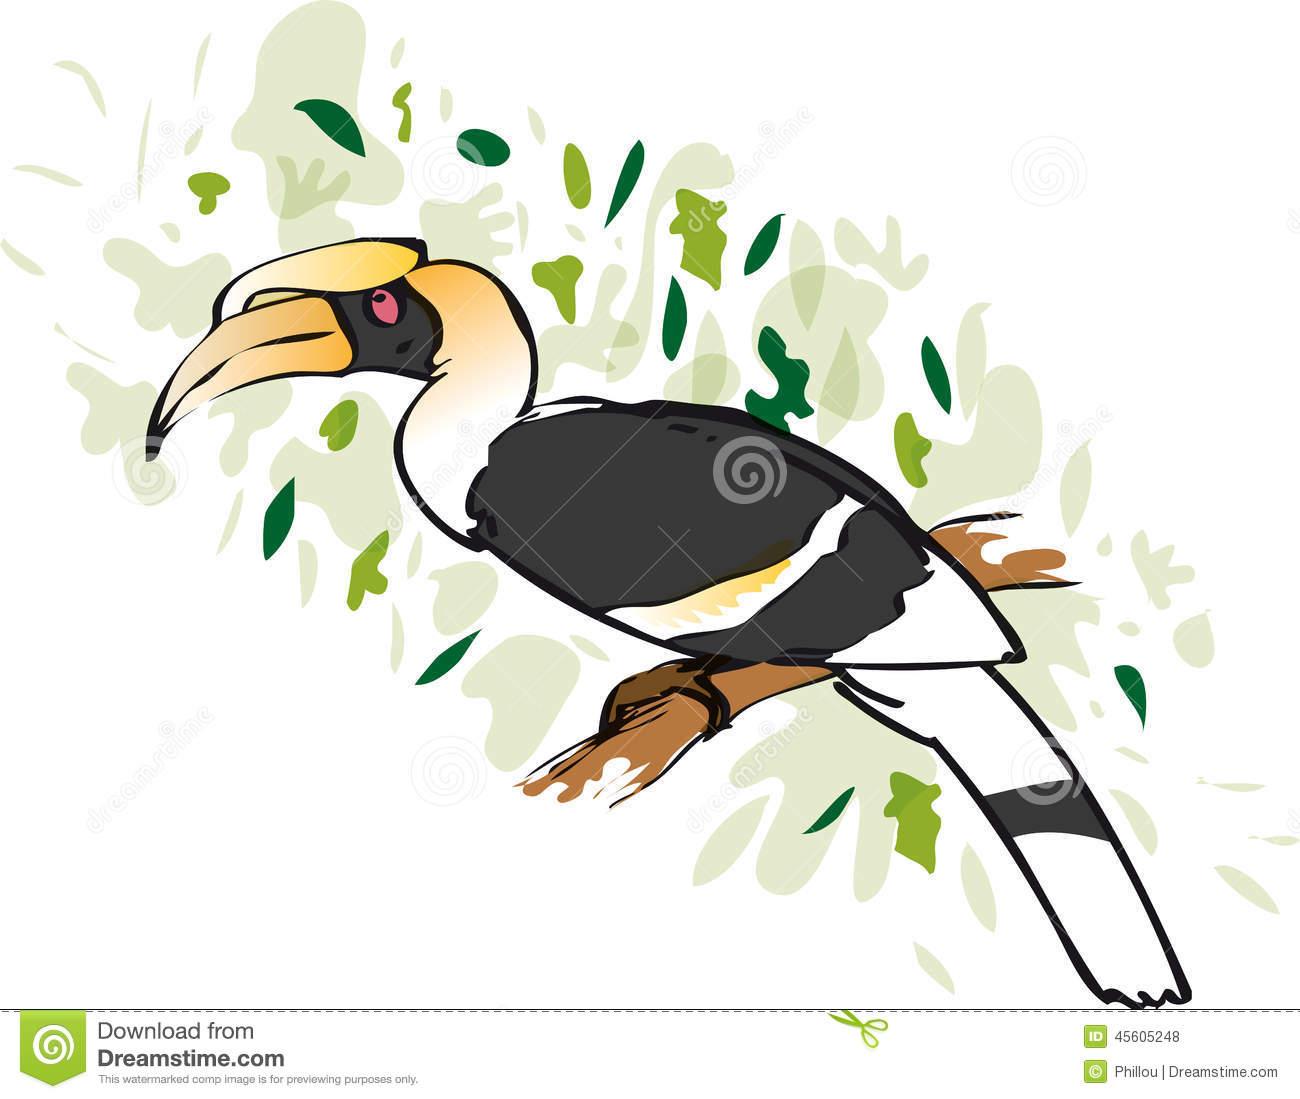 Rhinoceros Hornbill clipart #15, Download drawings